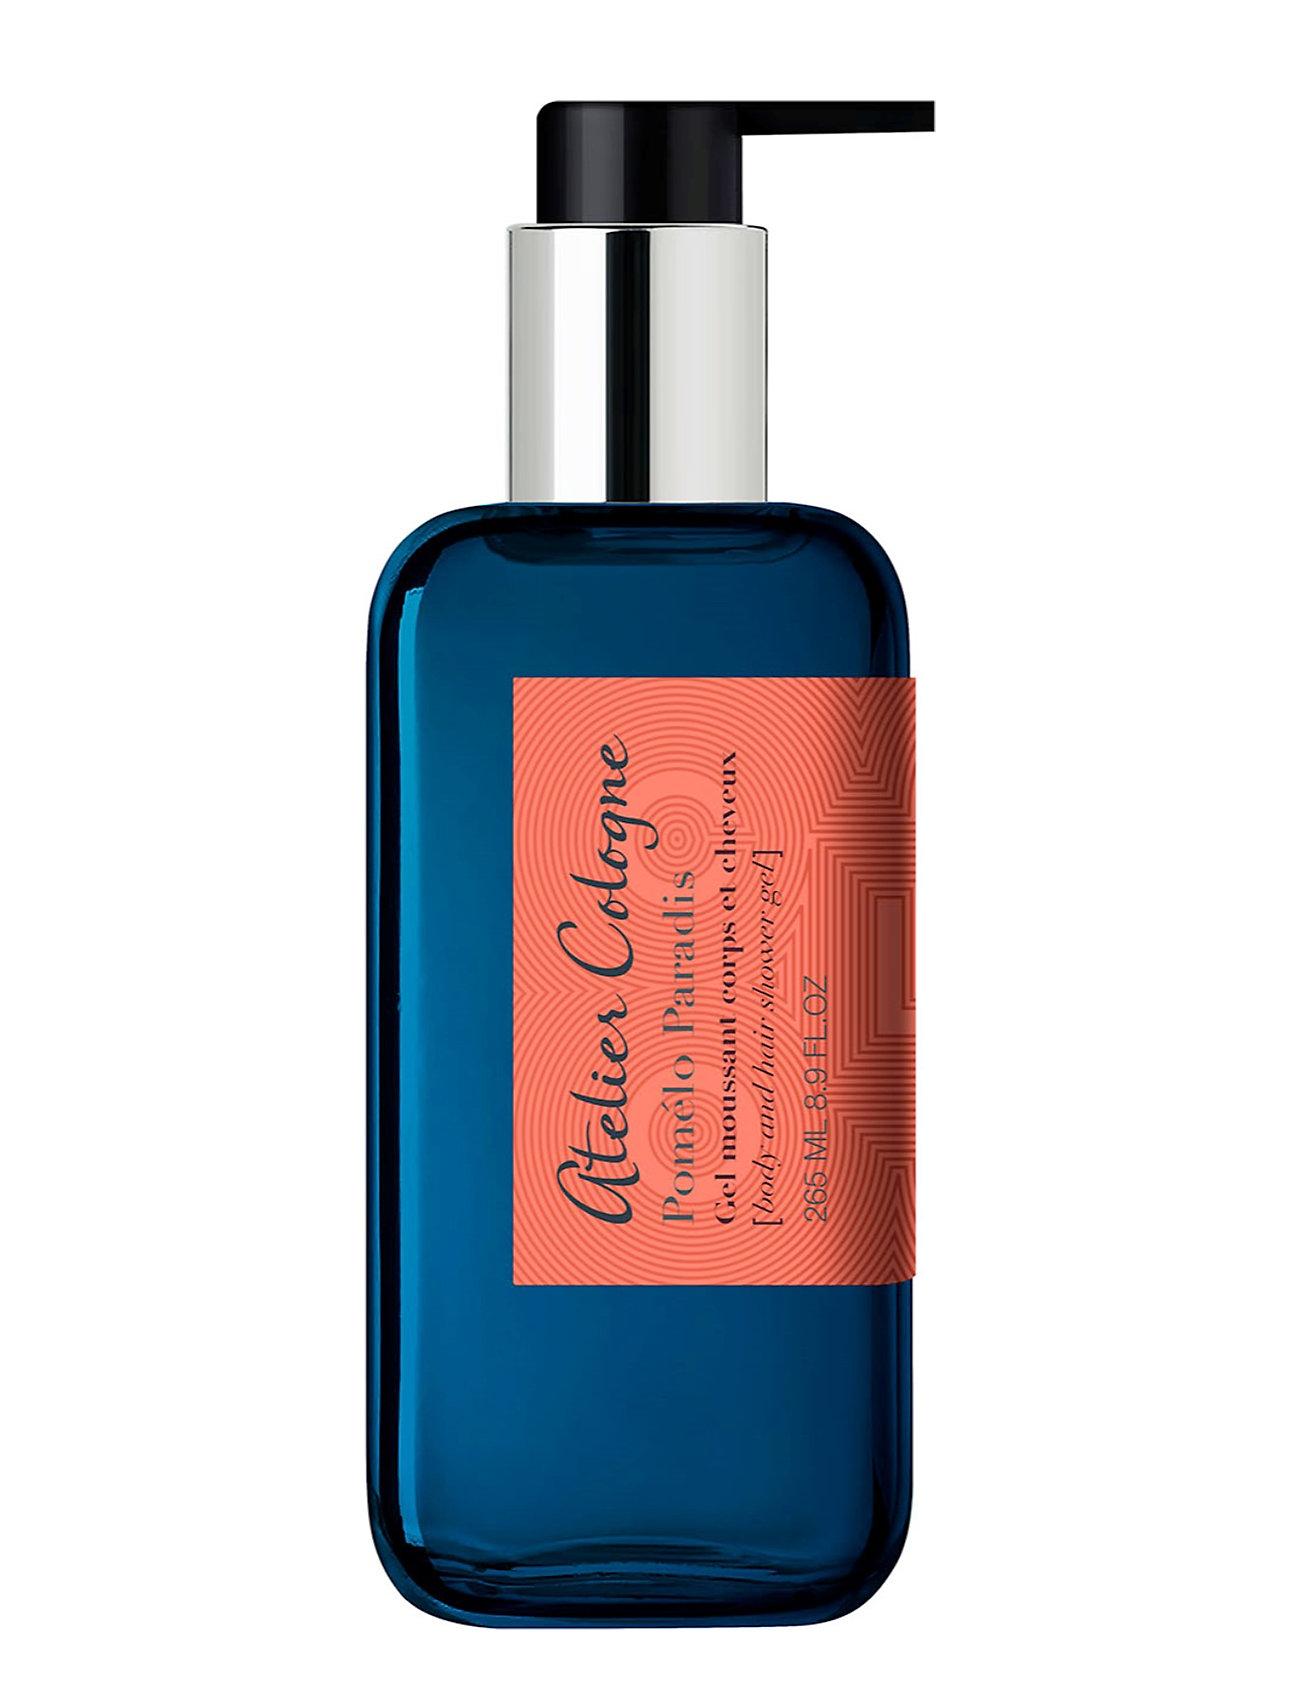 atelier cologne – Pomã‰lo paradis body & hair shampoo 265 m fra boozt.com dk